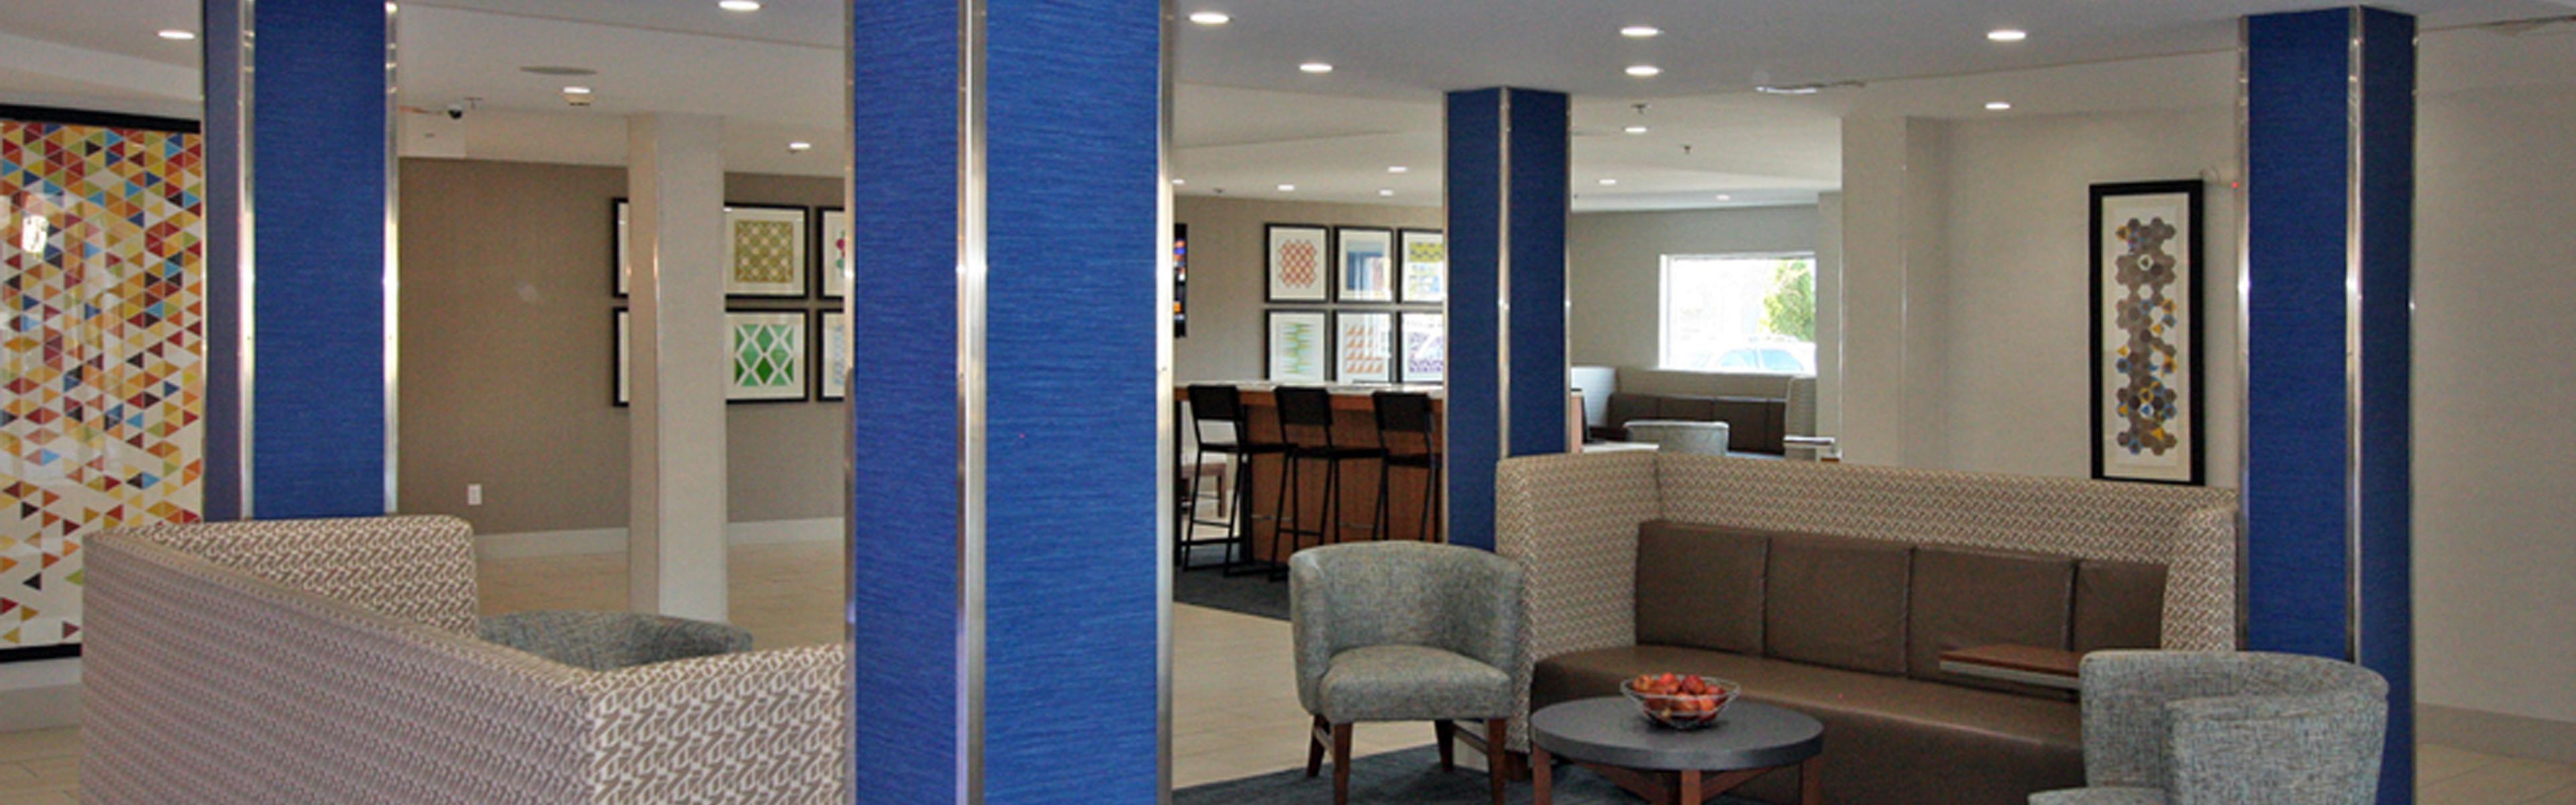 LOBBY; Hotel Lobby ... & Holiday Inn Express Branford-New Haven Hotel by IHG azcodes.com